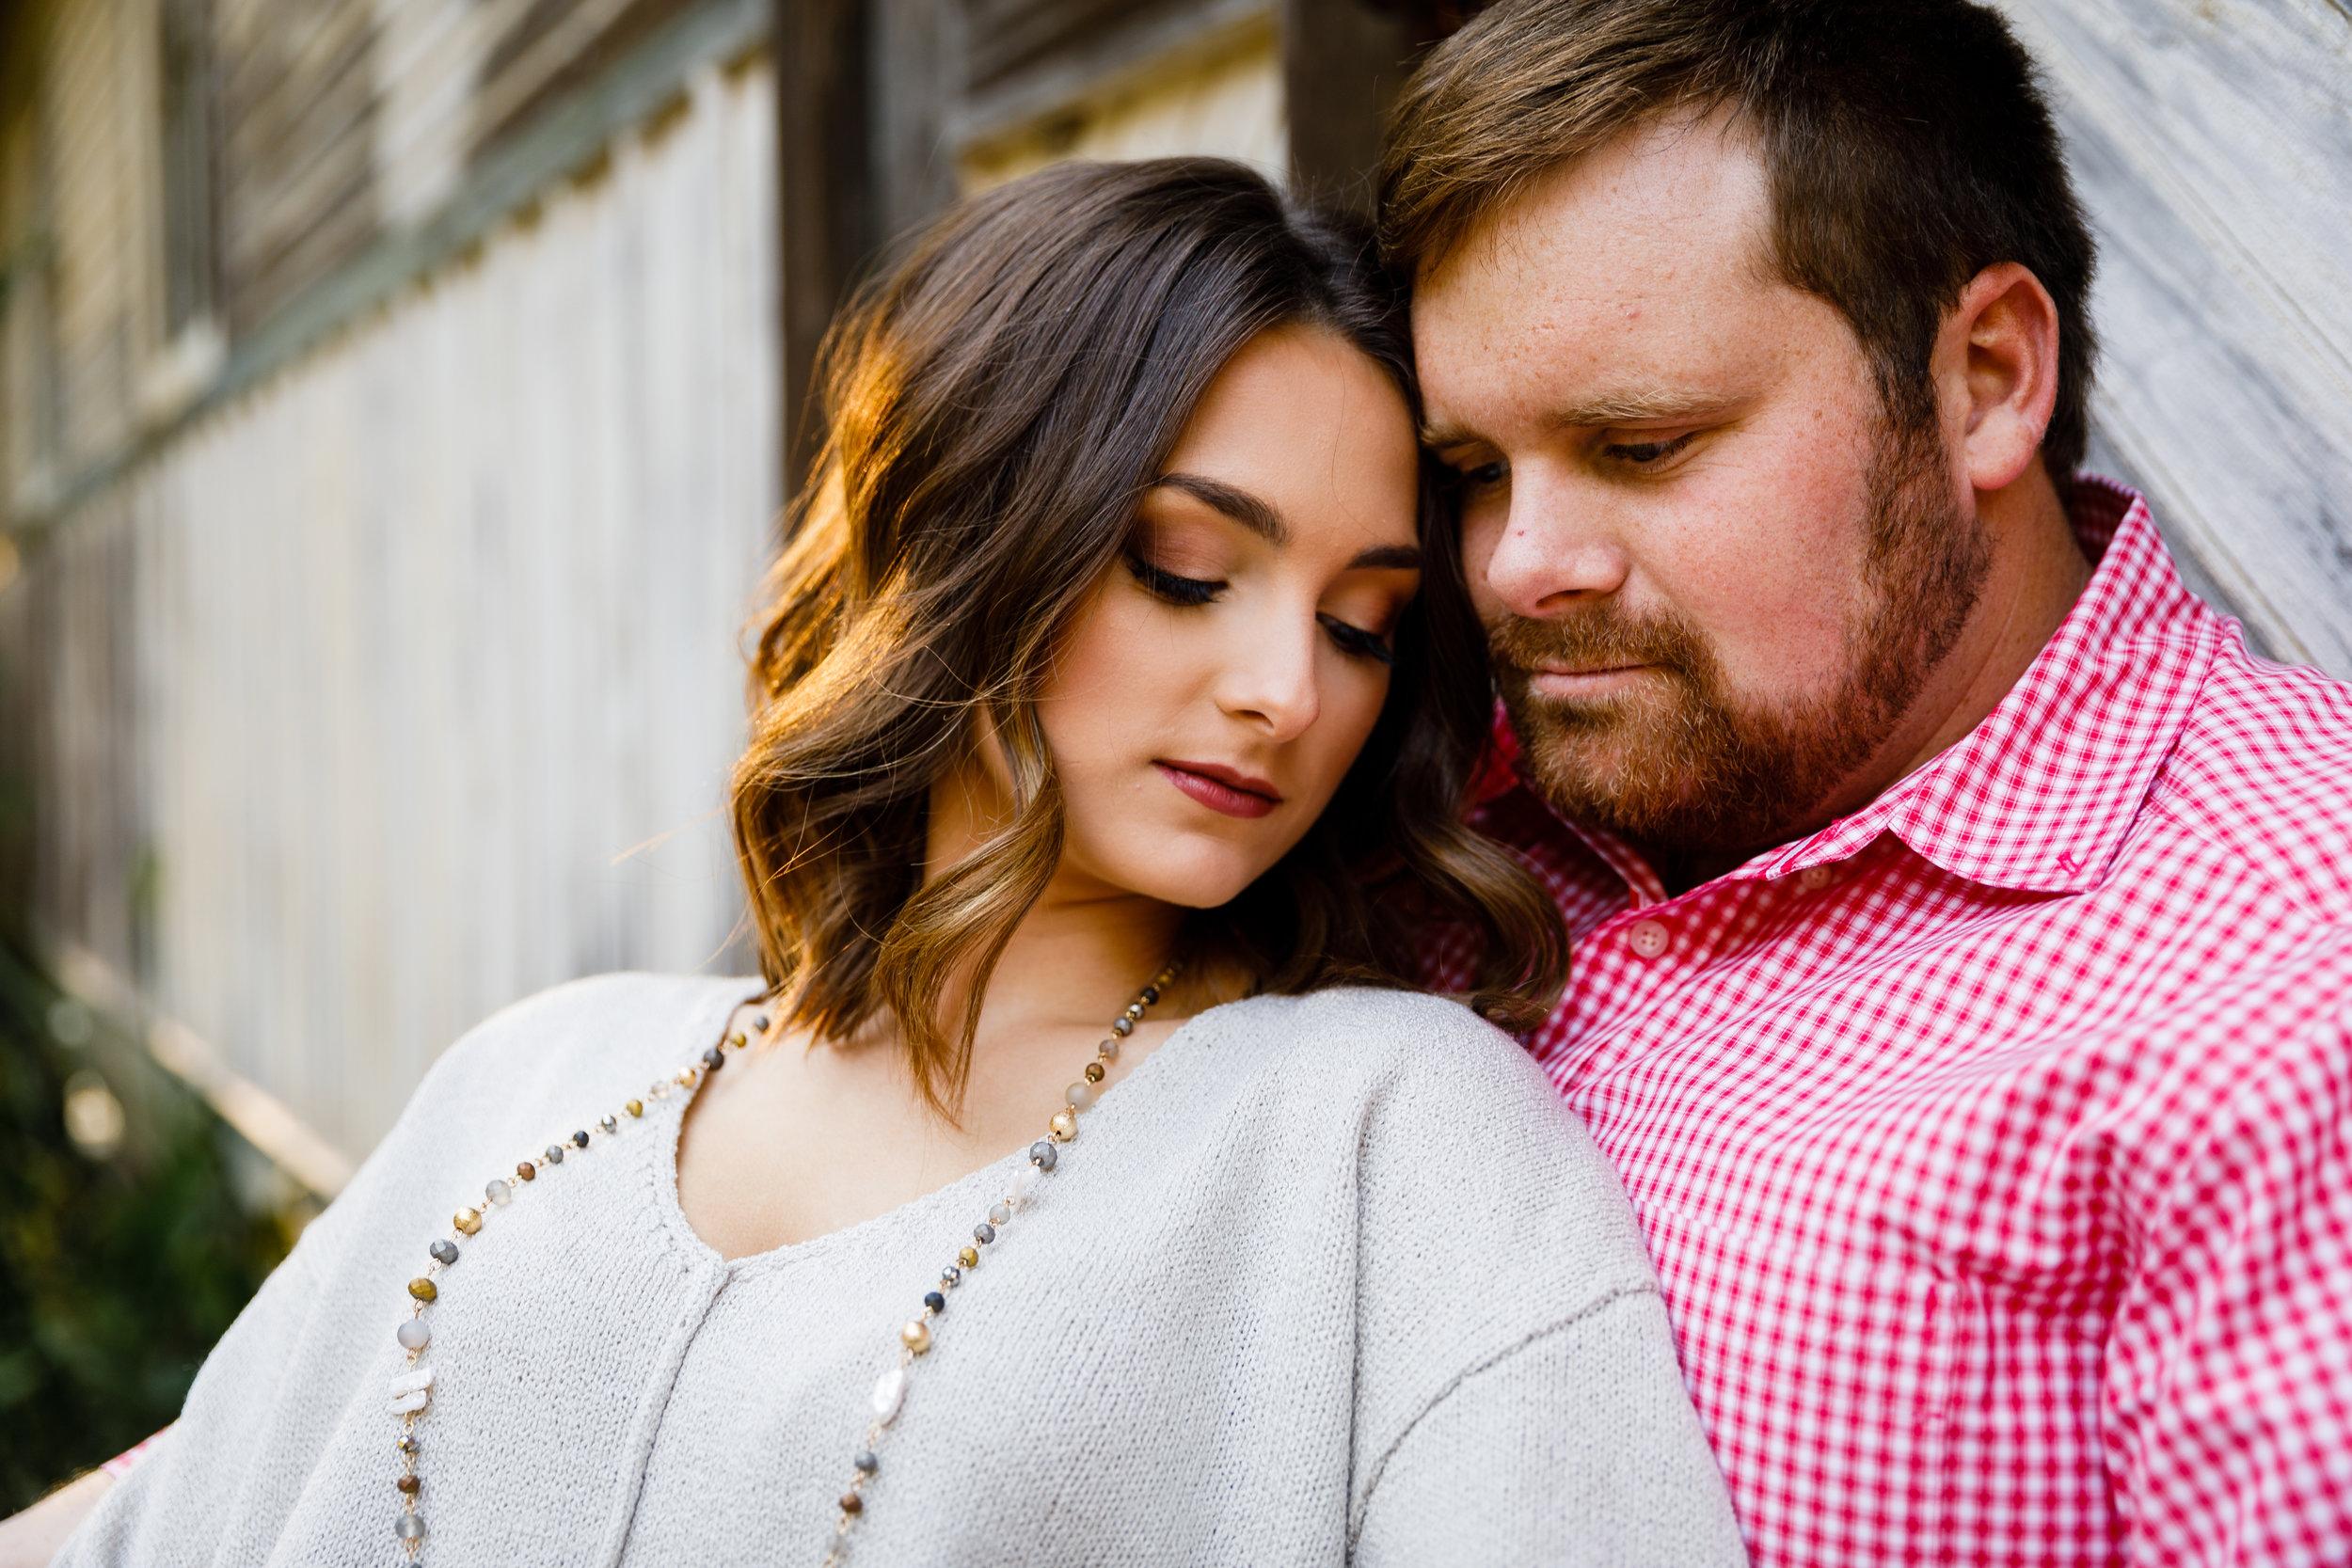 Youngsville-lafayette-portrait-family-wedding-photographer-0498.jpg